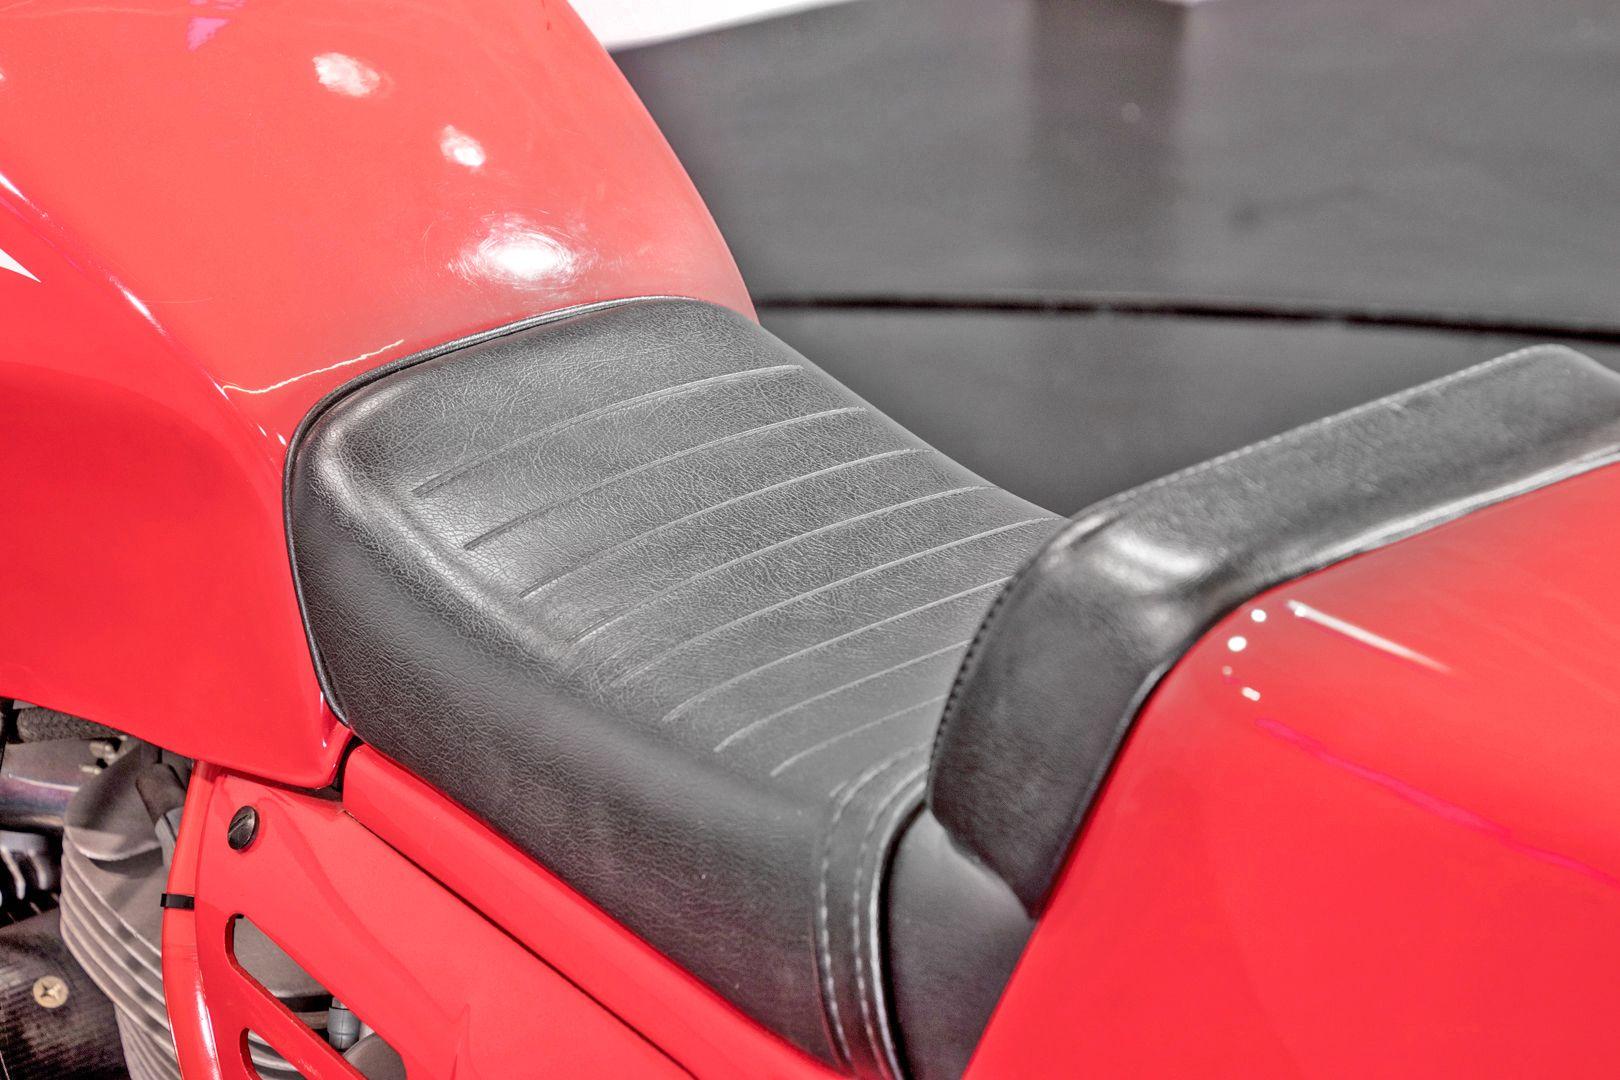 1984 Ducati 900 Mike Hailwood Replica 81555